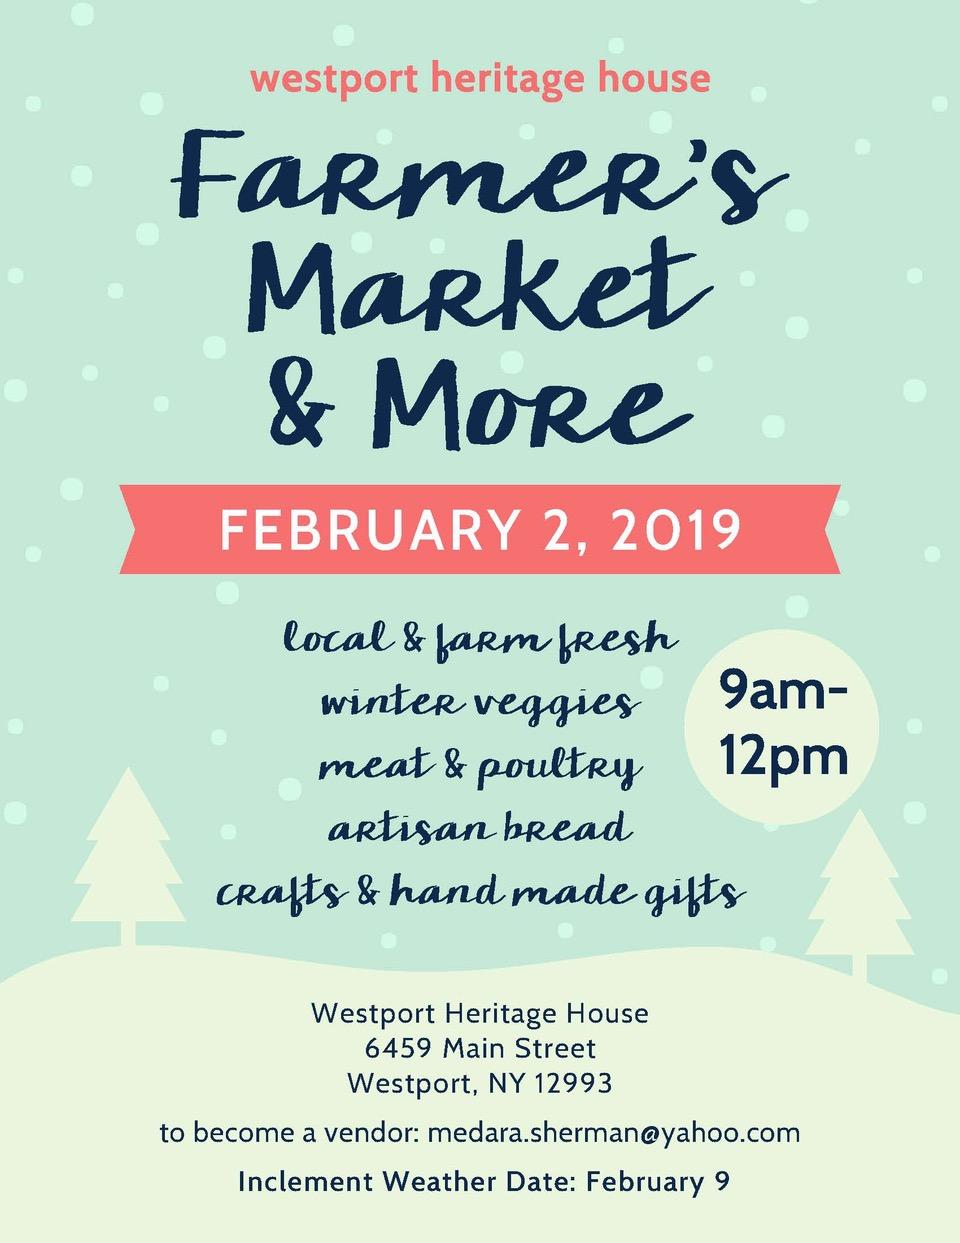 HH_FarmersMarket_Feb2019.jpg